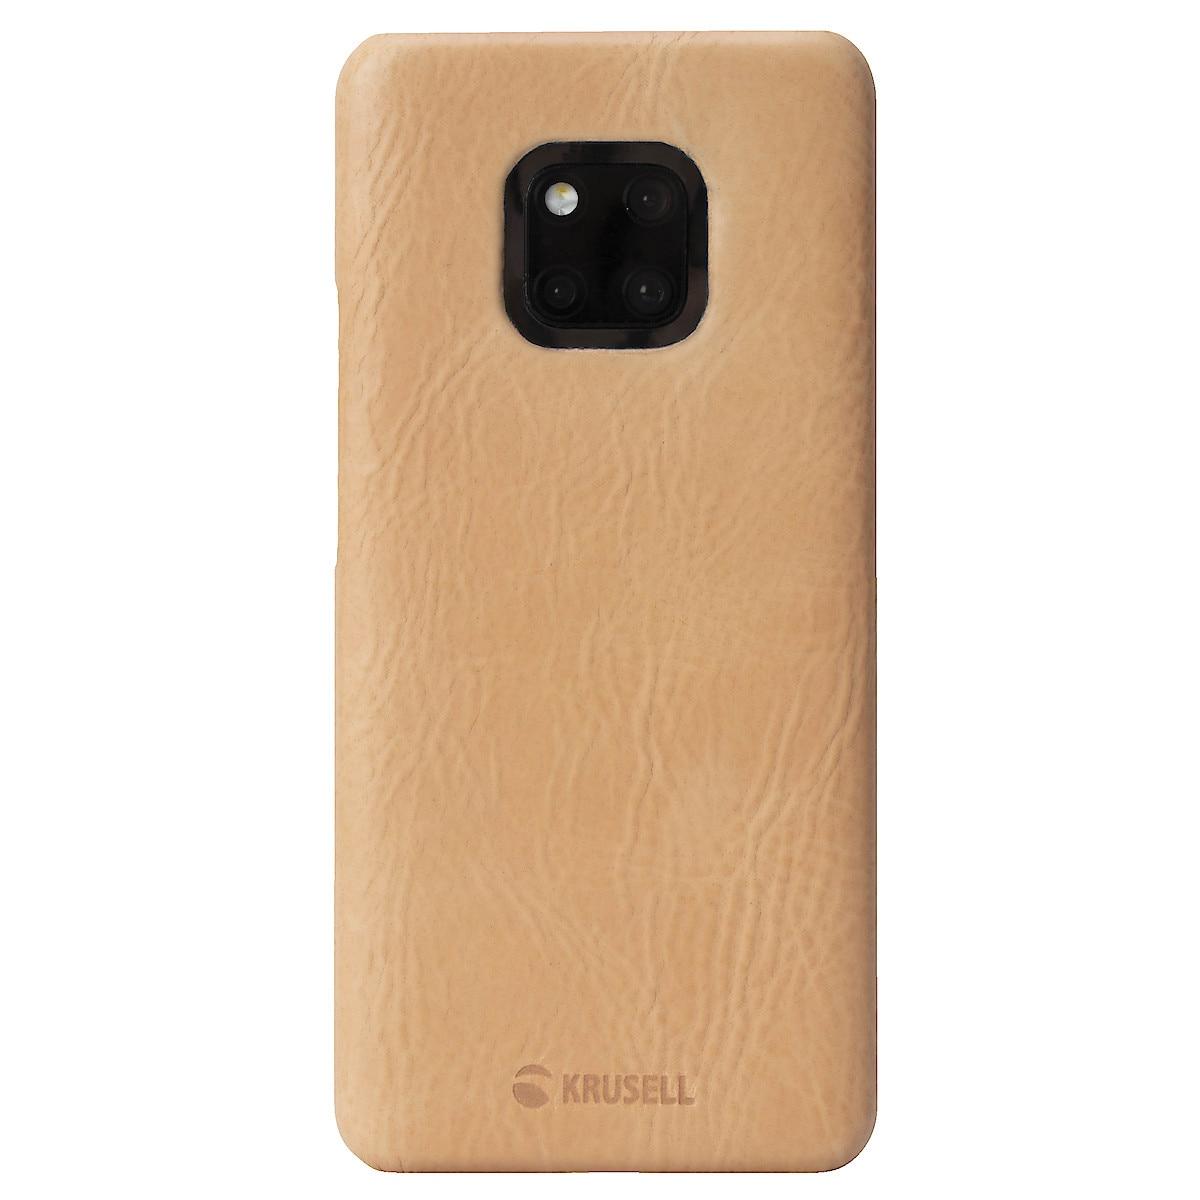 Handycover für Huawei Mate 20 Pro, Krusell